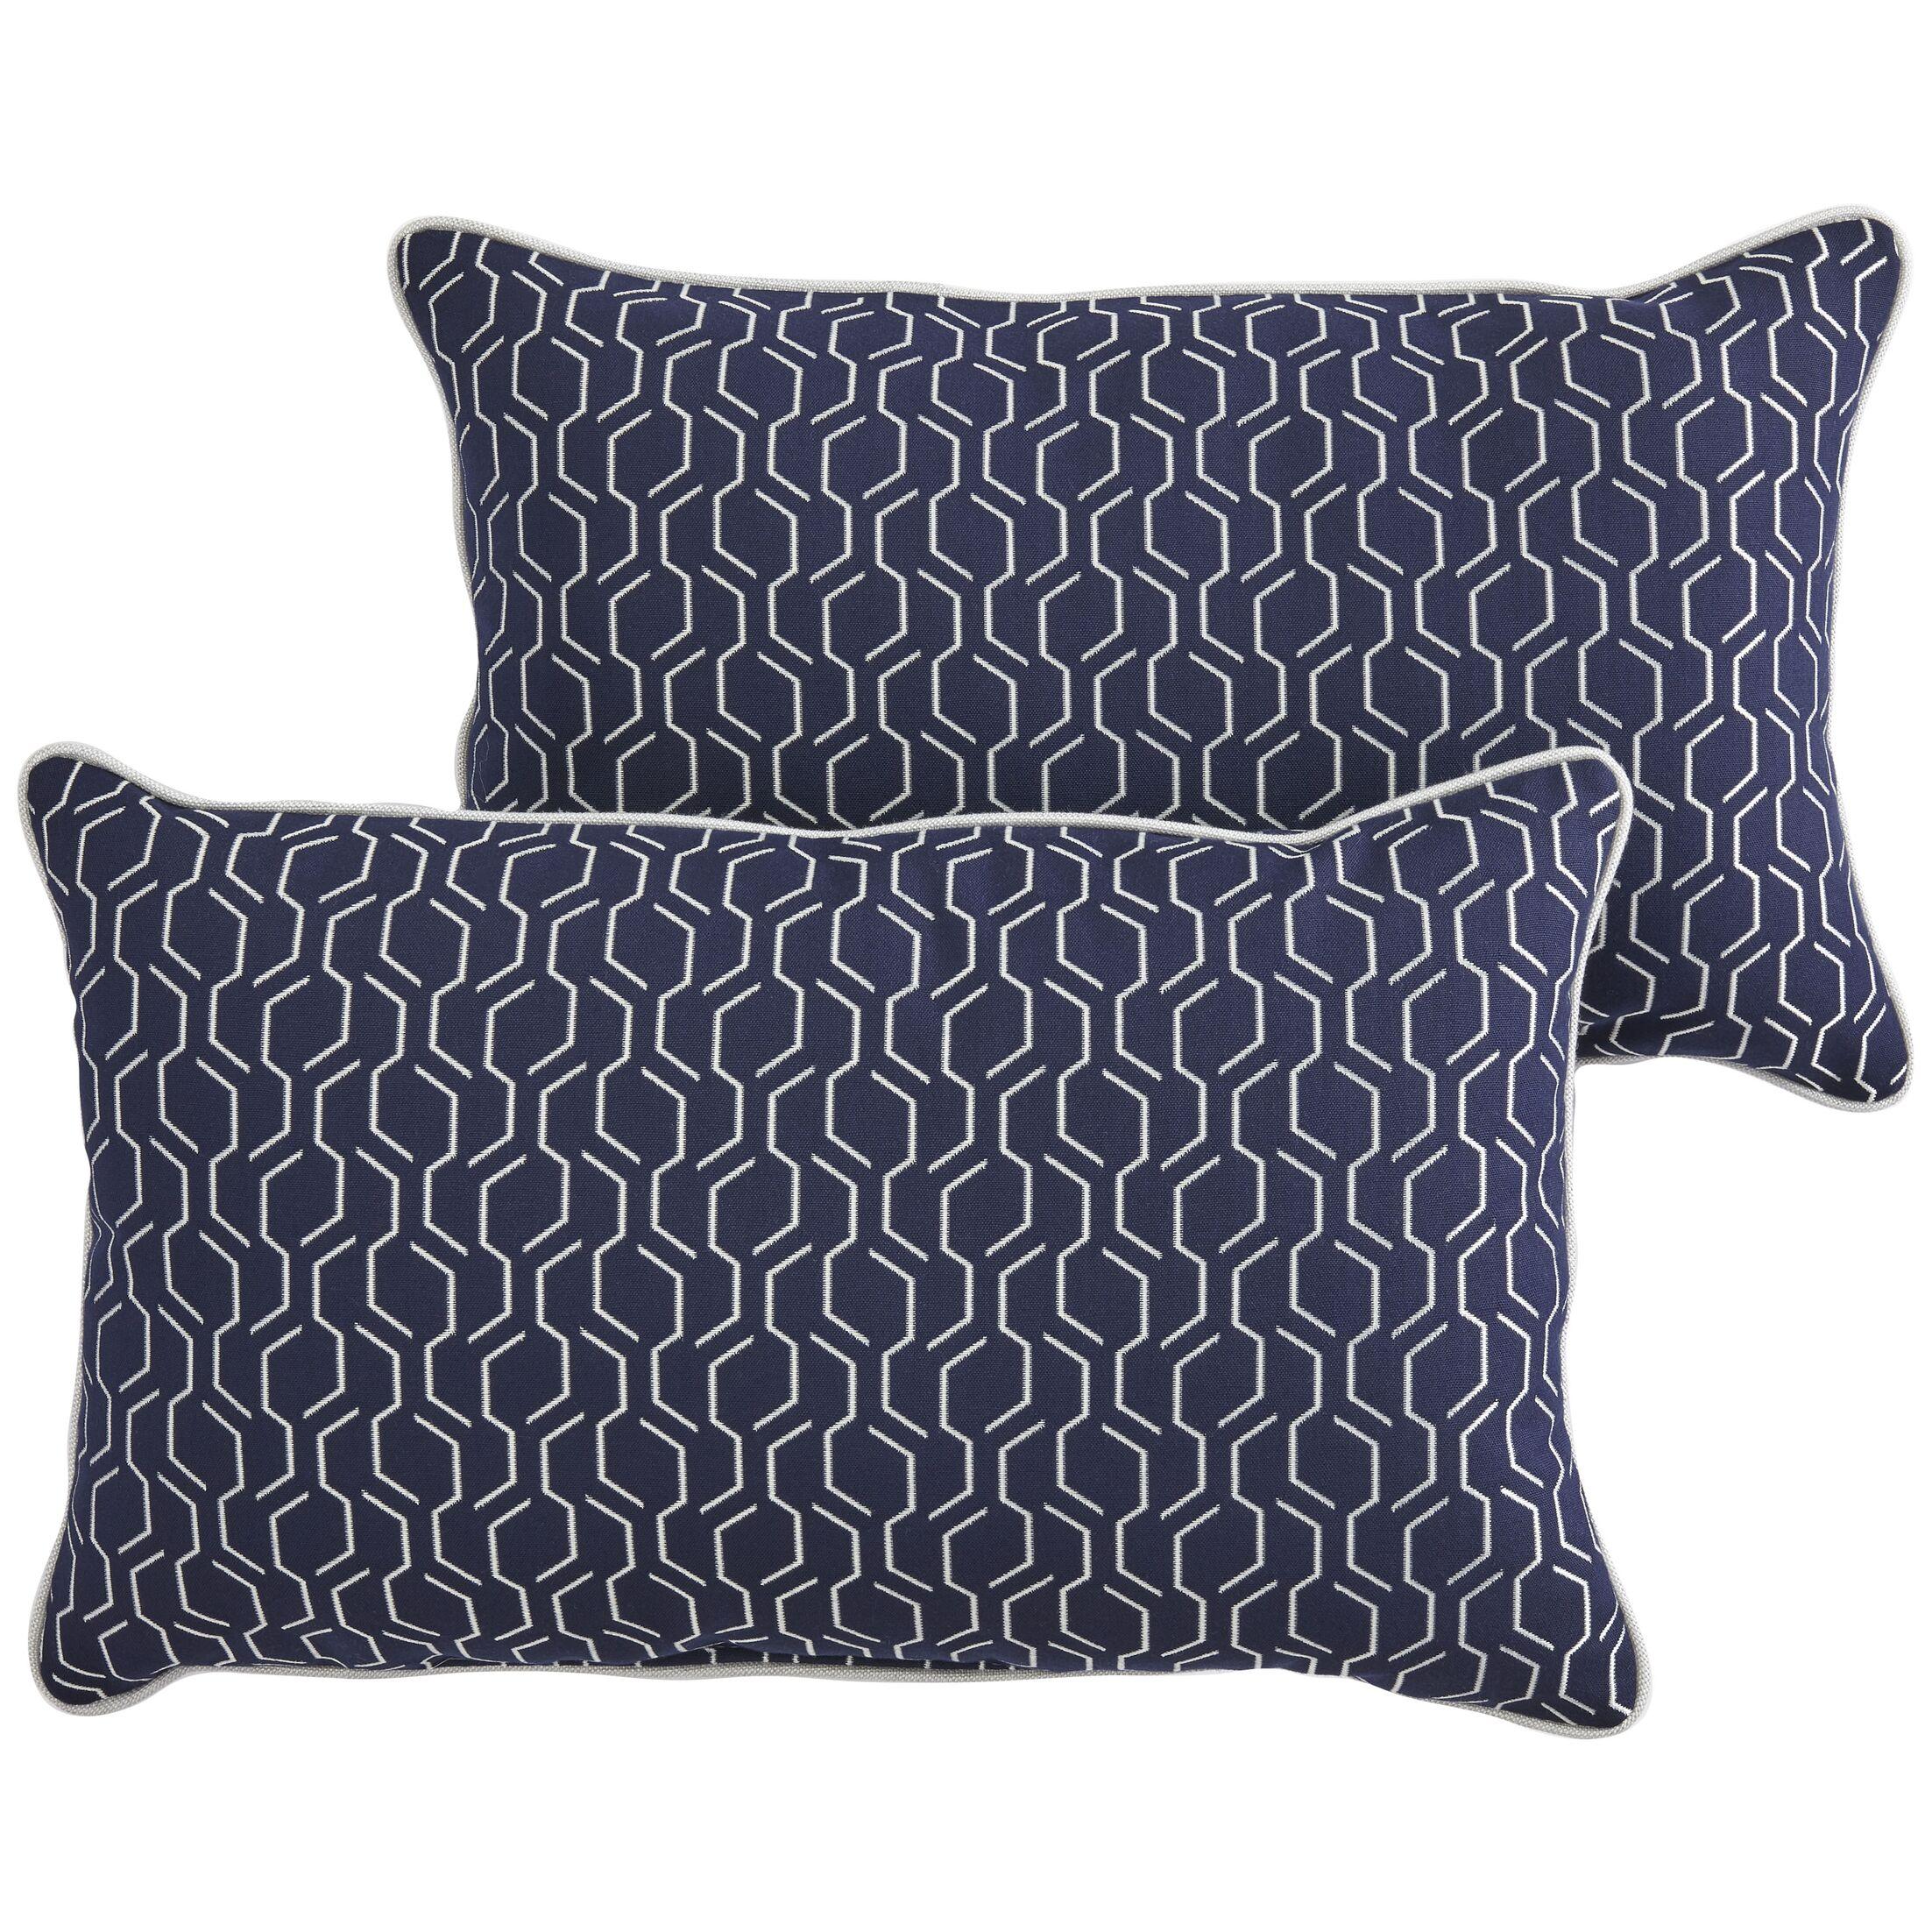 Hugley Indoor/Outdoor Sunbrella Lumbar Pillow